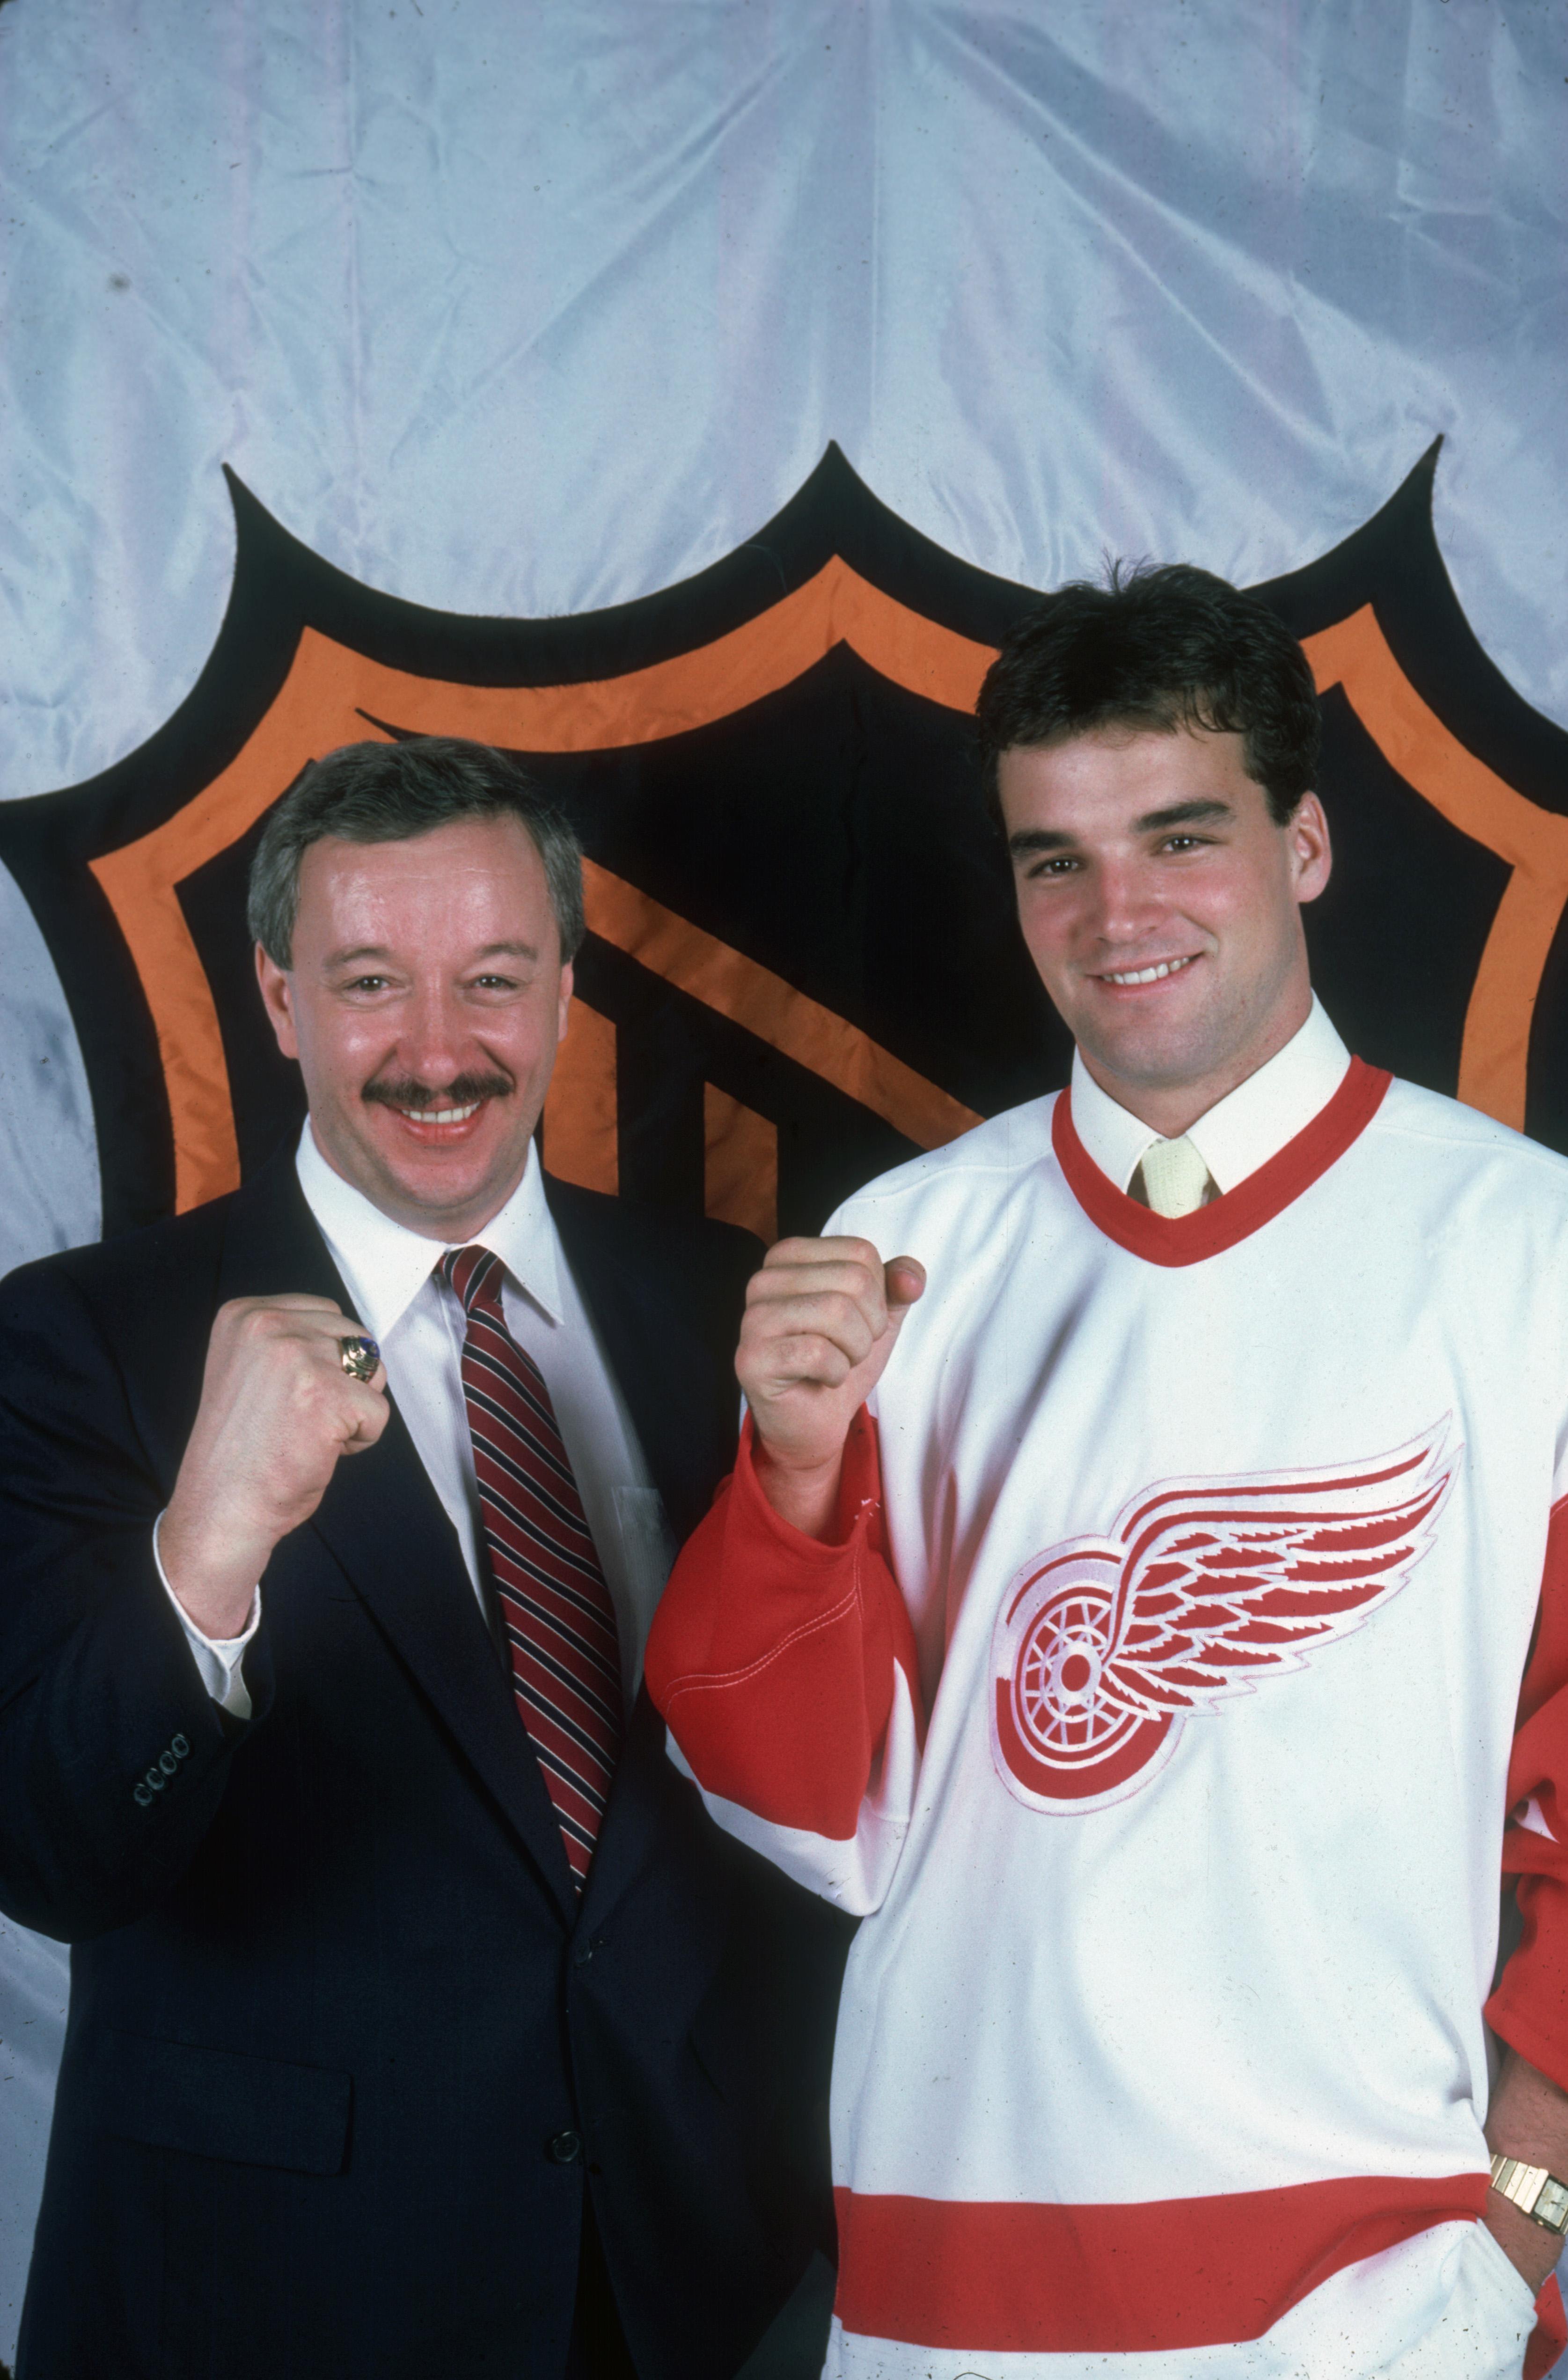 Joe Murphy, Red Wings #1 Draft Pick